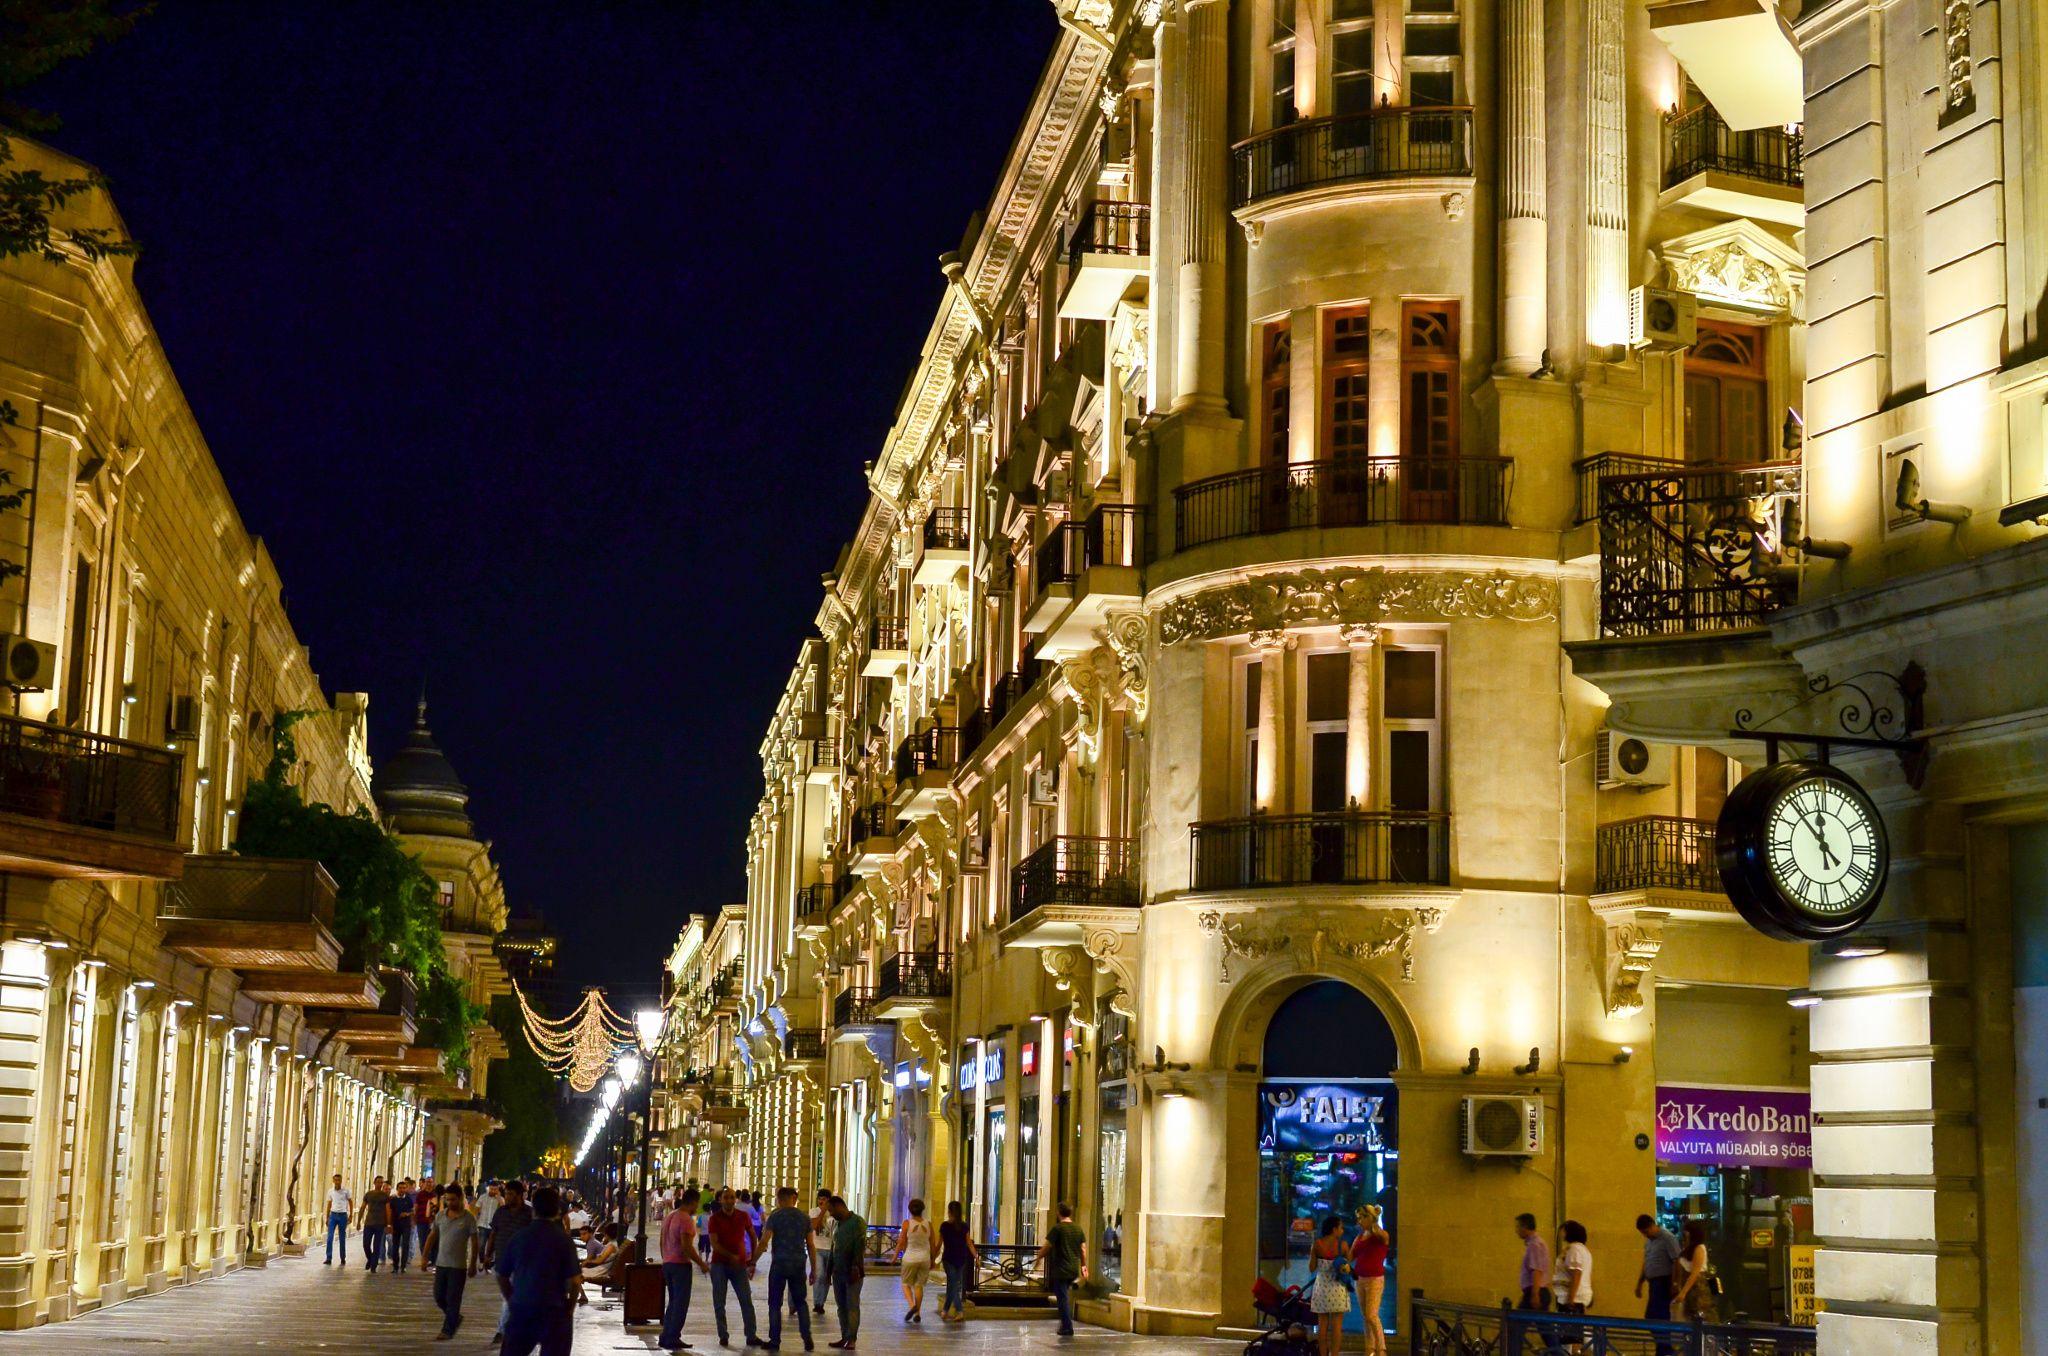 Tarqovi Baku Tarqovi The Shopping District Of Baku Is Probably One Of The Walking Tour Ferry Building San Francisco Photography Tours